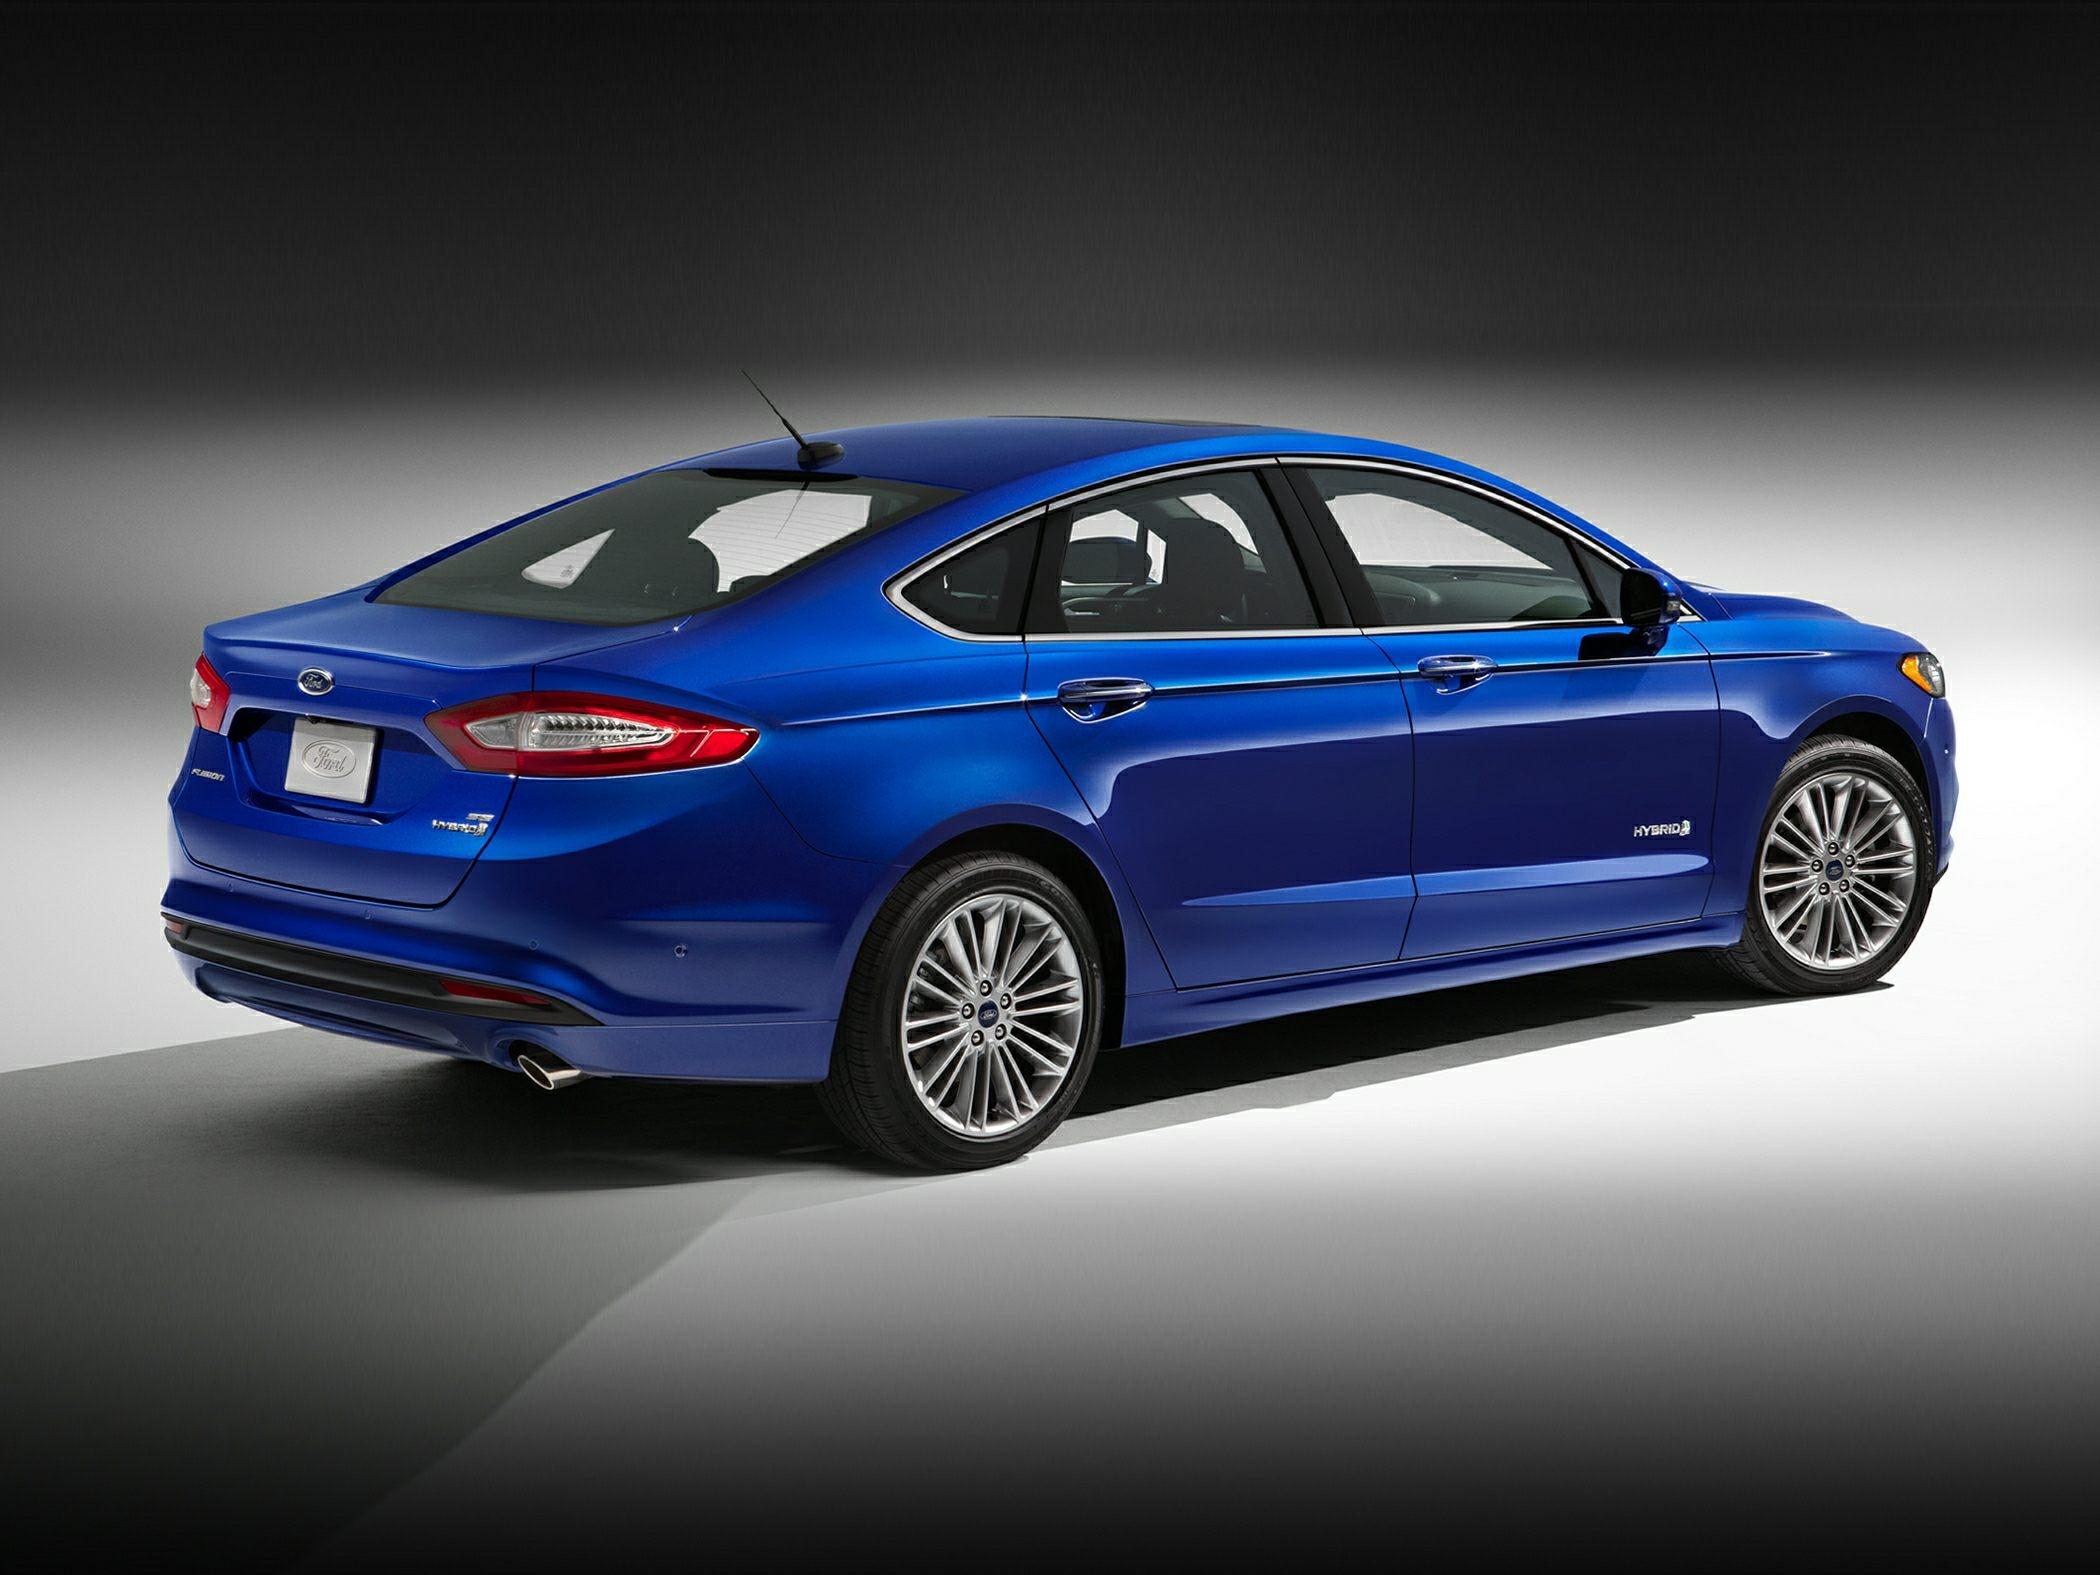 2016 Ford Fusion Hybrid Se >> 2016 Ford Fusion Wallpaper - WallpaperSafari